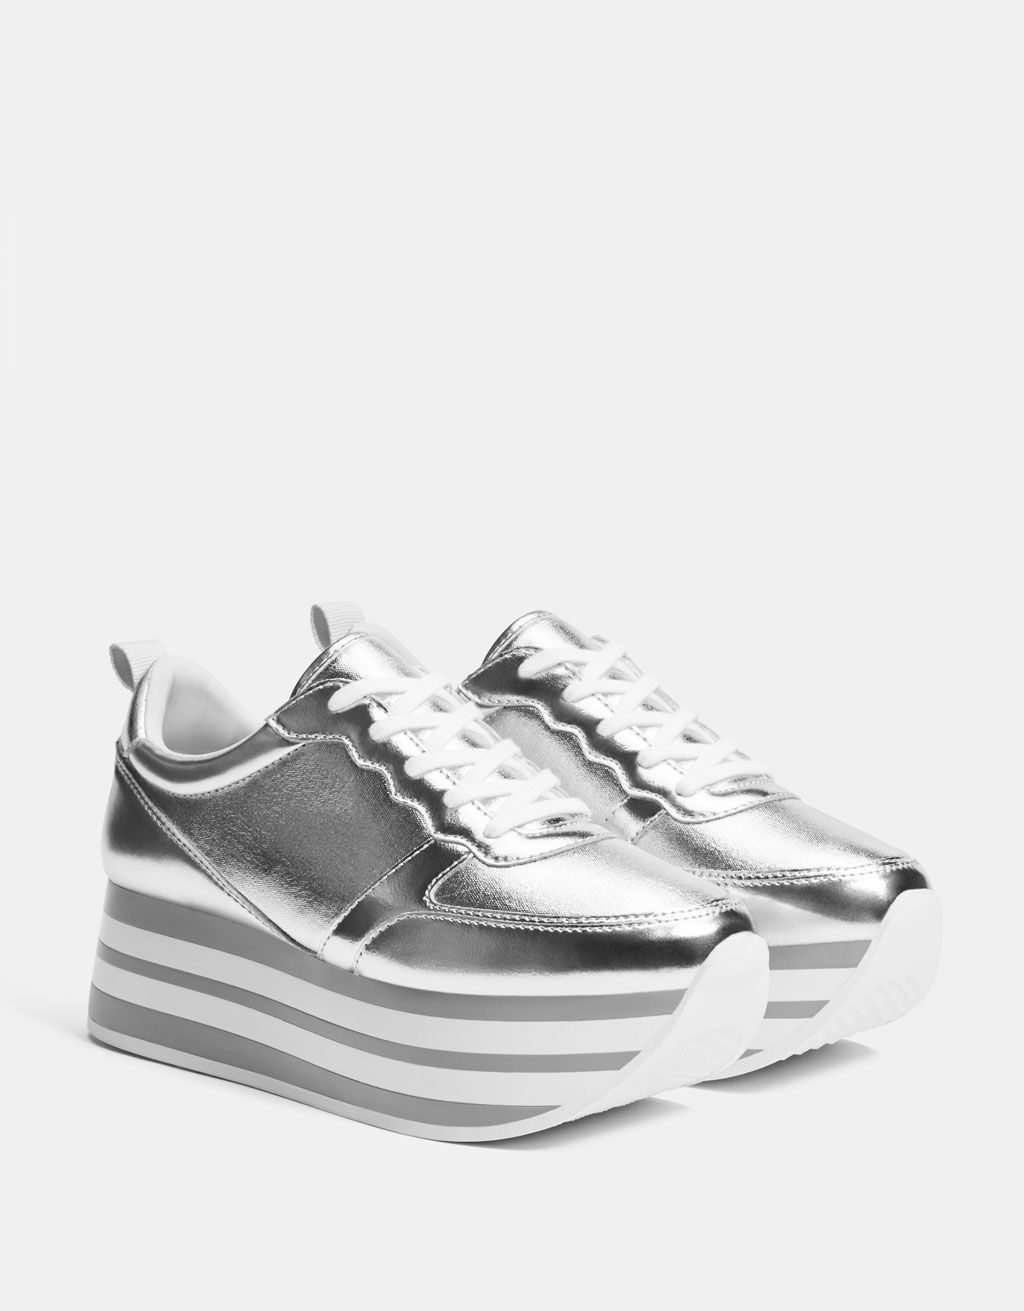 0c39e168199a Srebrne sportowe buty na platformie. Srebrne sportowe buty na platformie  Top